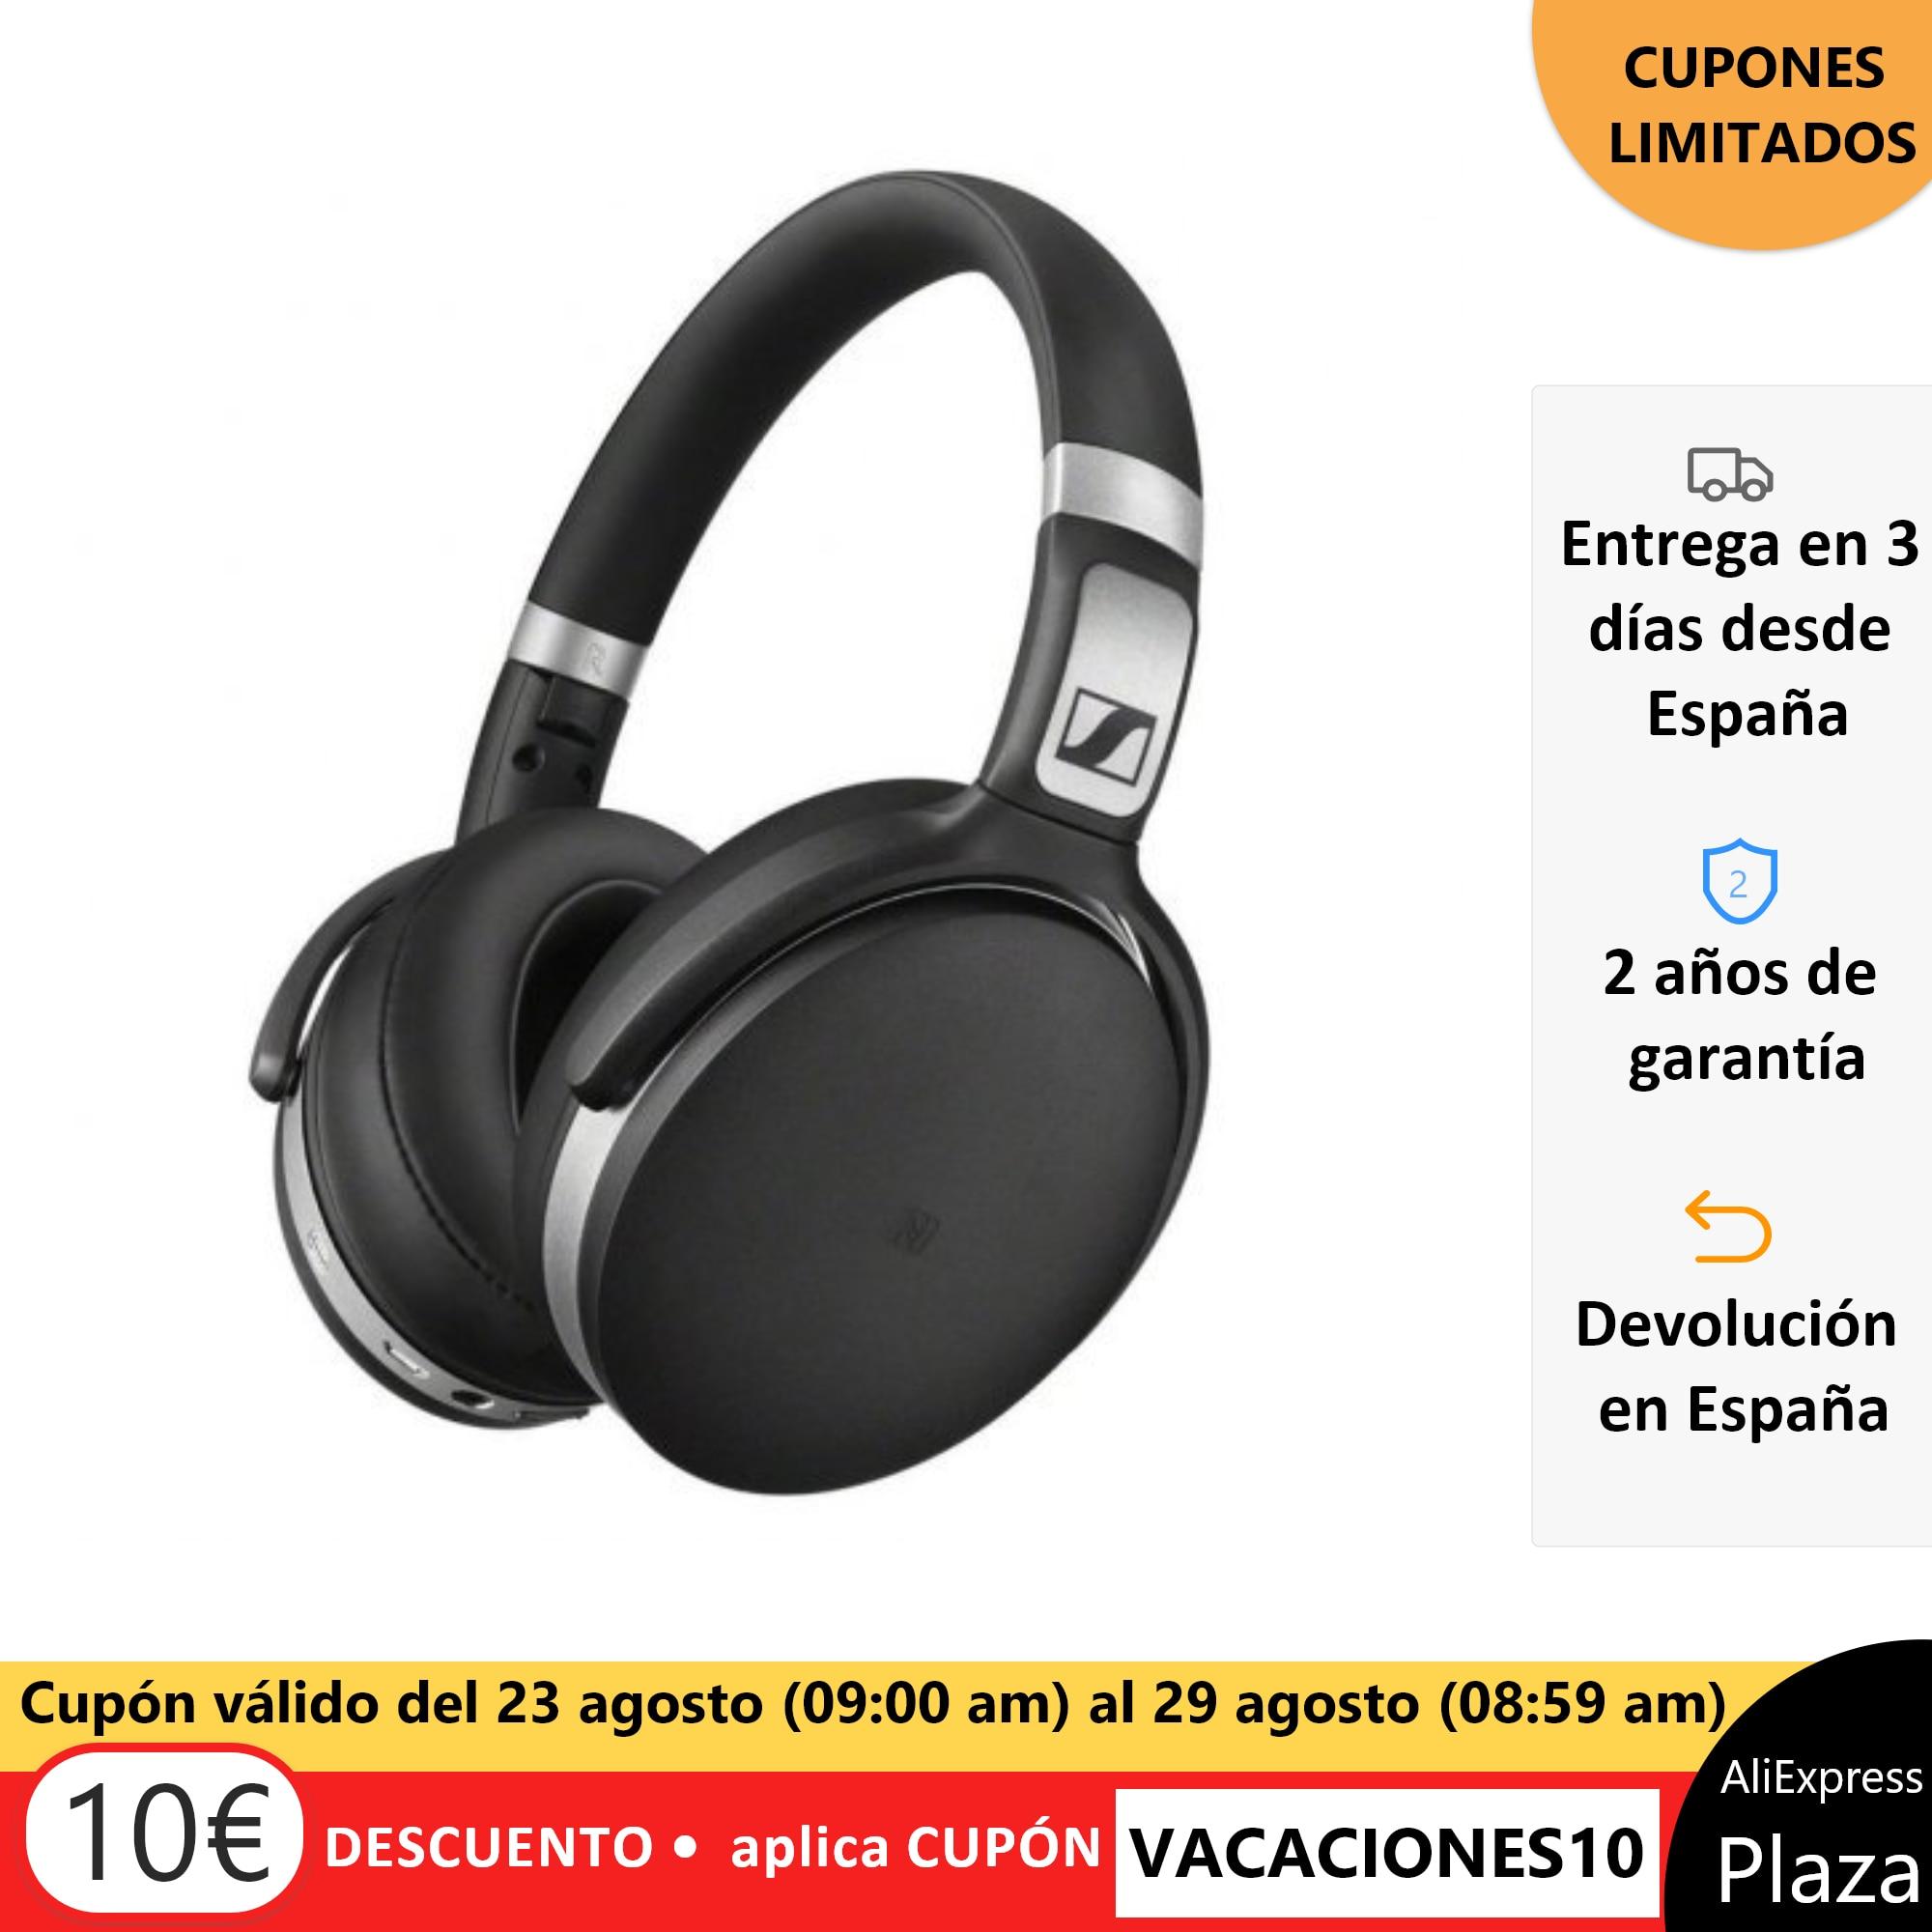 Sennheiser headphones BLUETOOTH HD 4 50 BTNC BLACK headset closed Original AliExpress square Spain